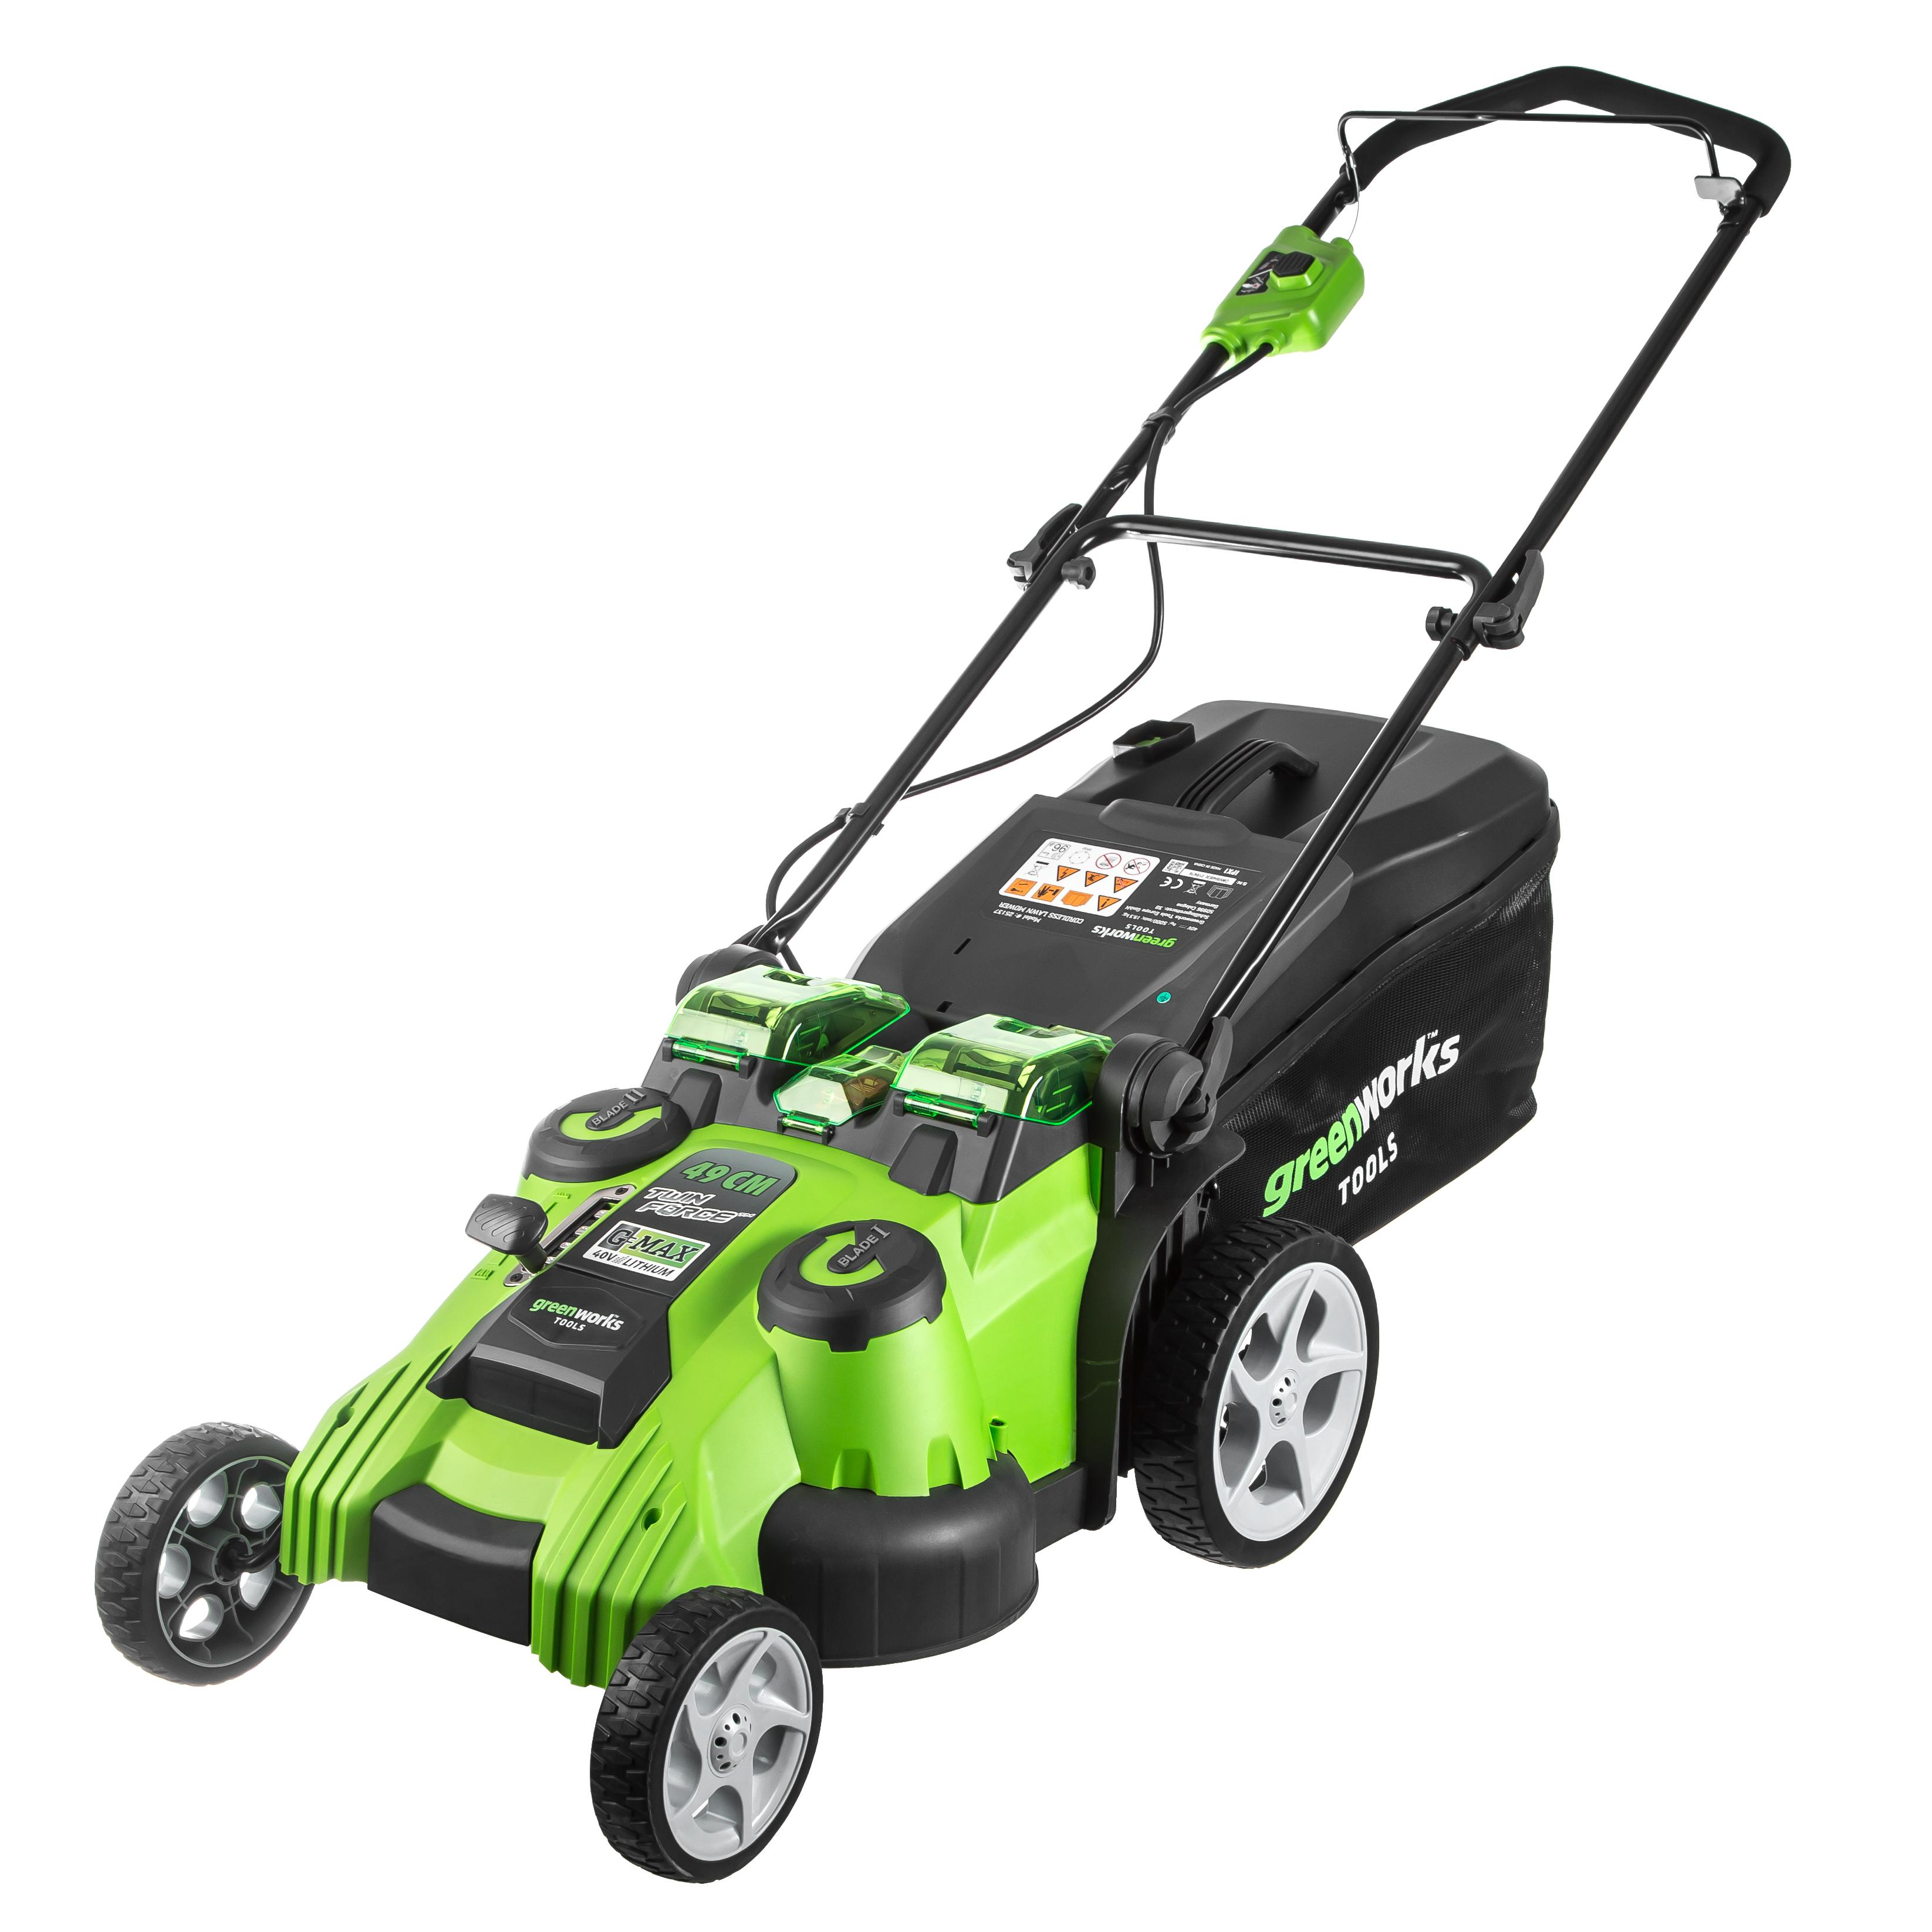 Аккумуляторная газонокосилка Greenworks G40lm49db (2500207) БЕЗ АКК. и ЗУ